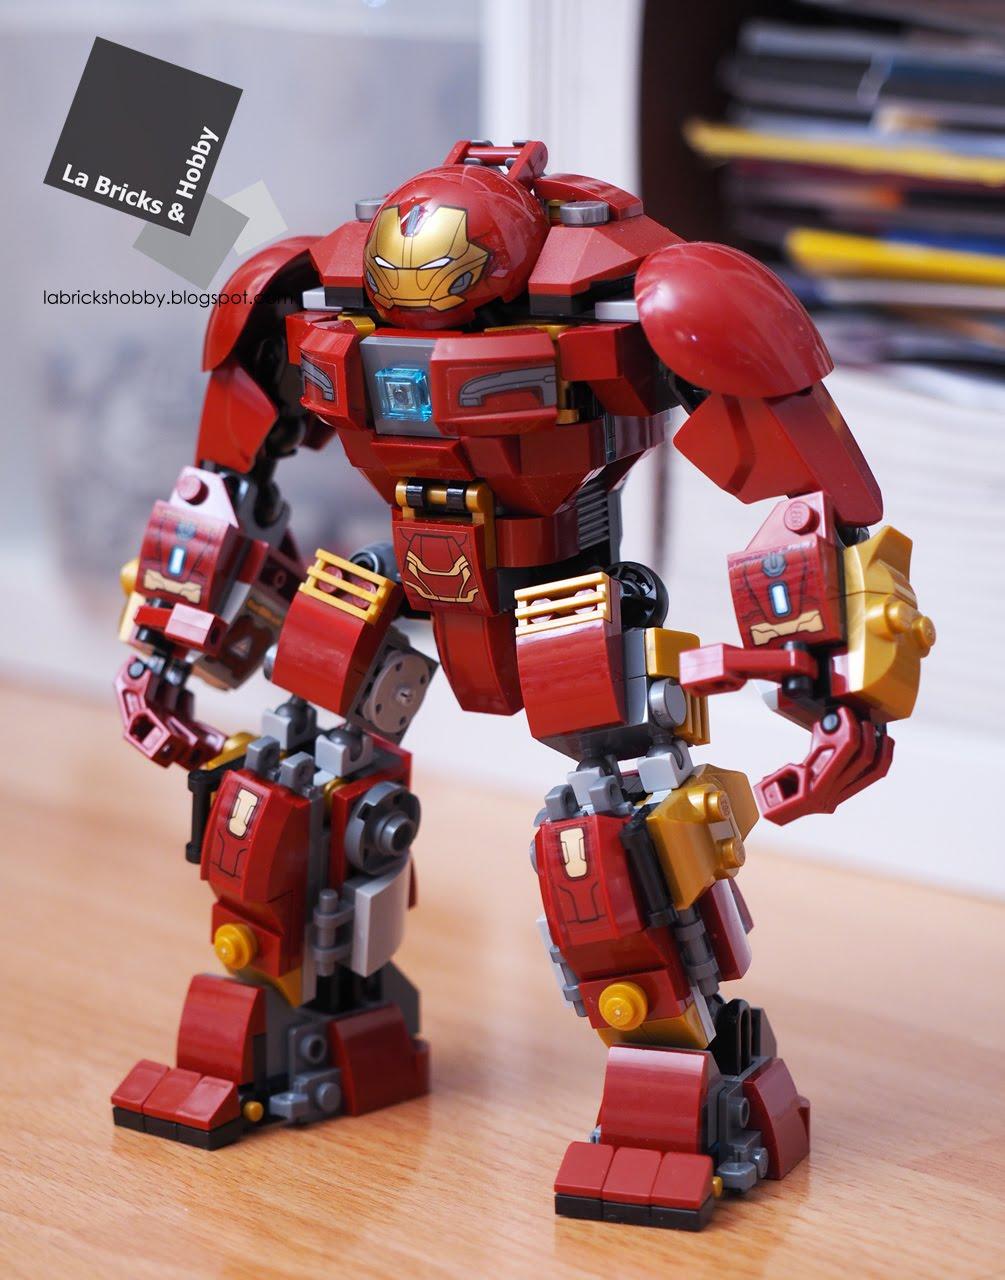 La Bricks & Hobby: Lego Marvel Super Heroes: The ...